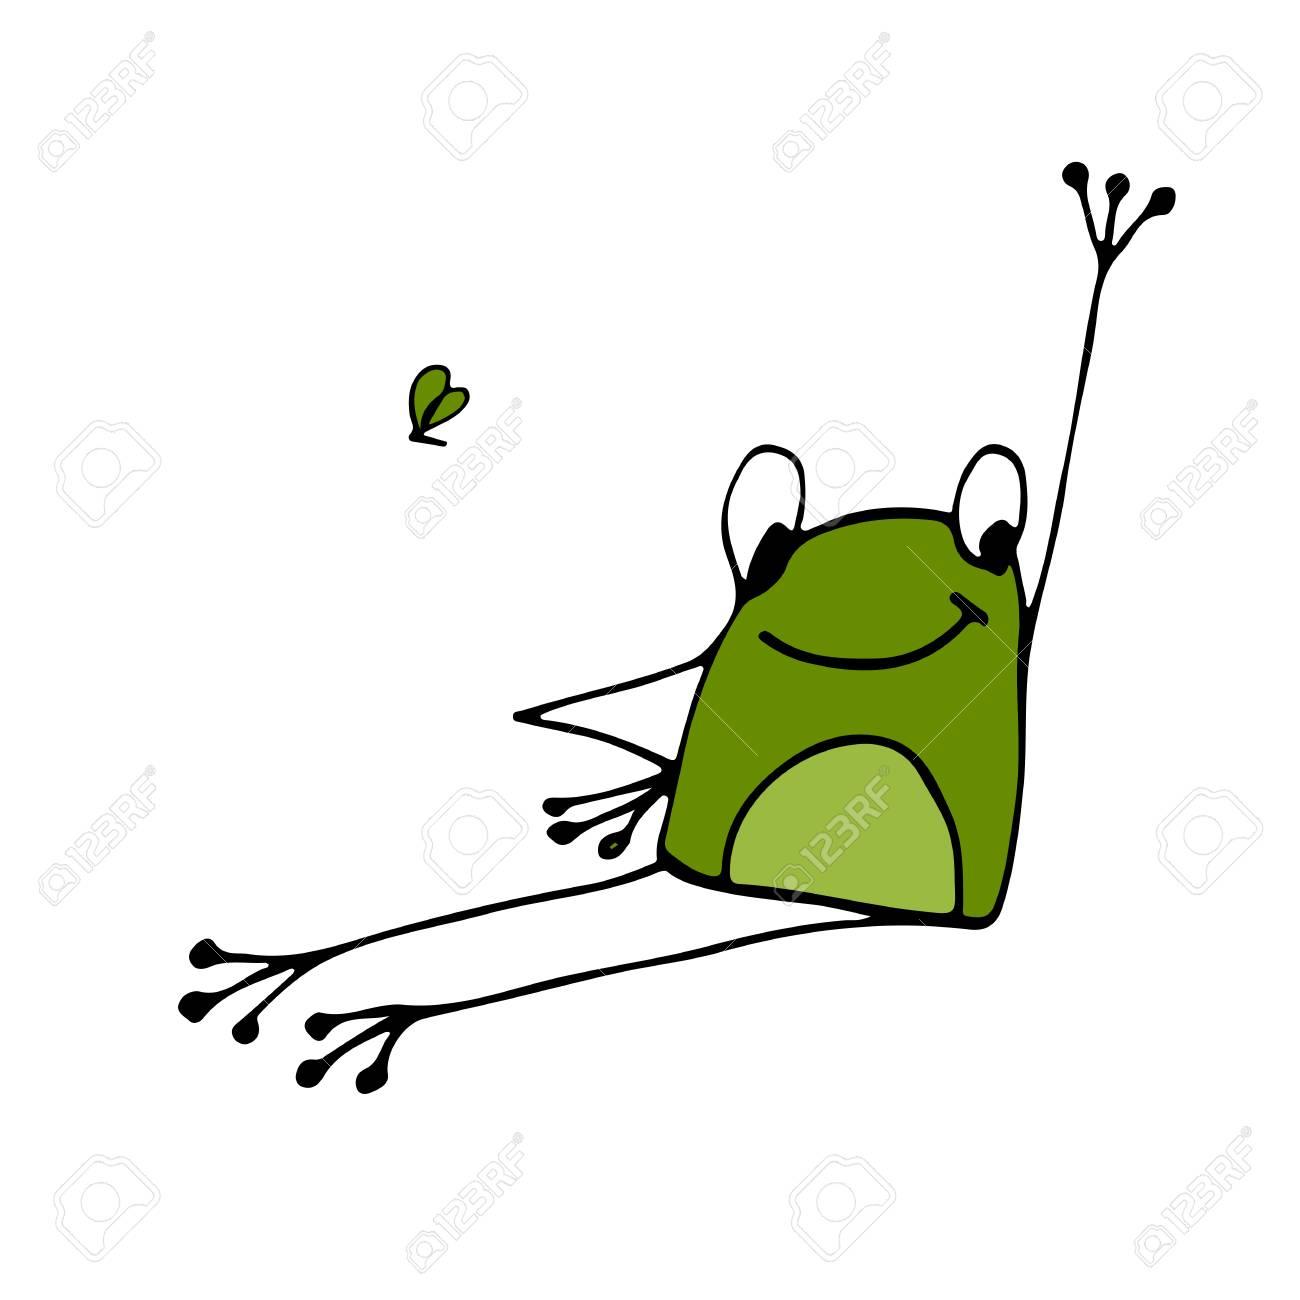 Lustige Yoga Frosch Skizze Fur Ihr Design Vektor Illustration